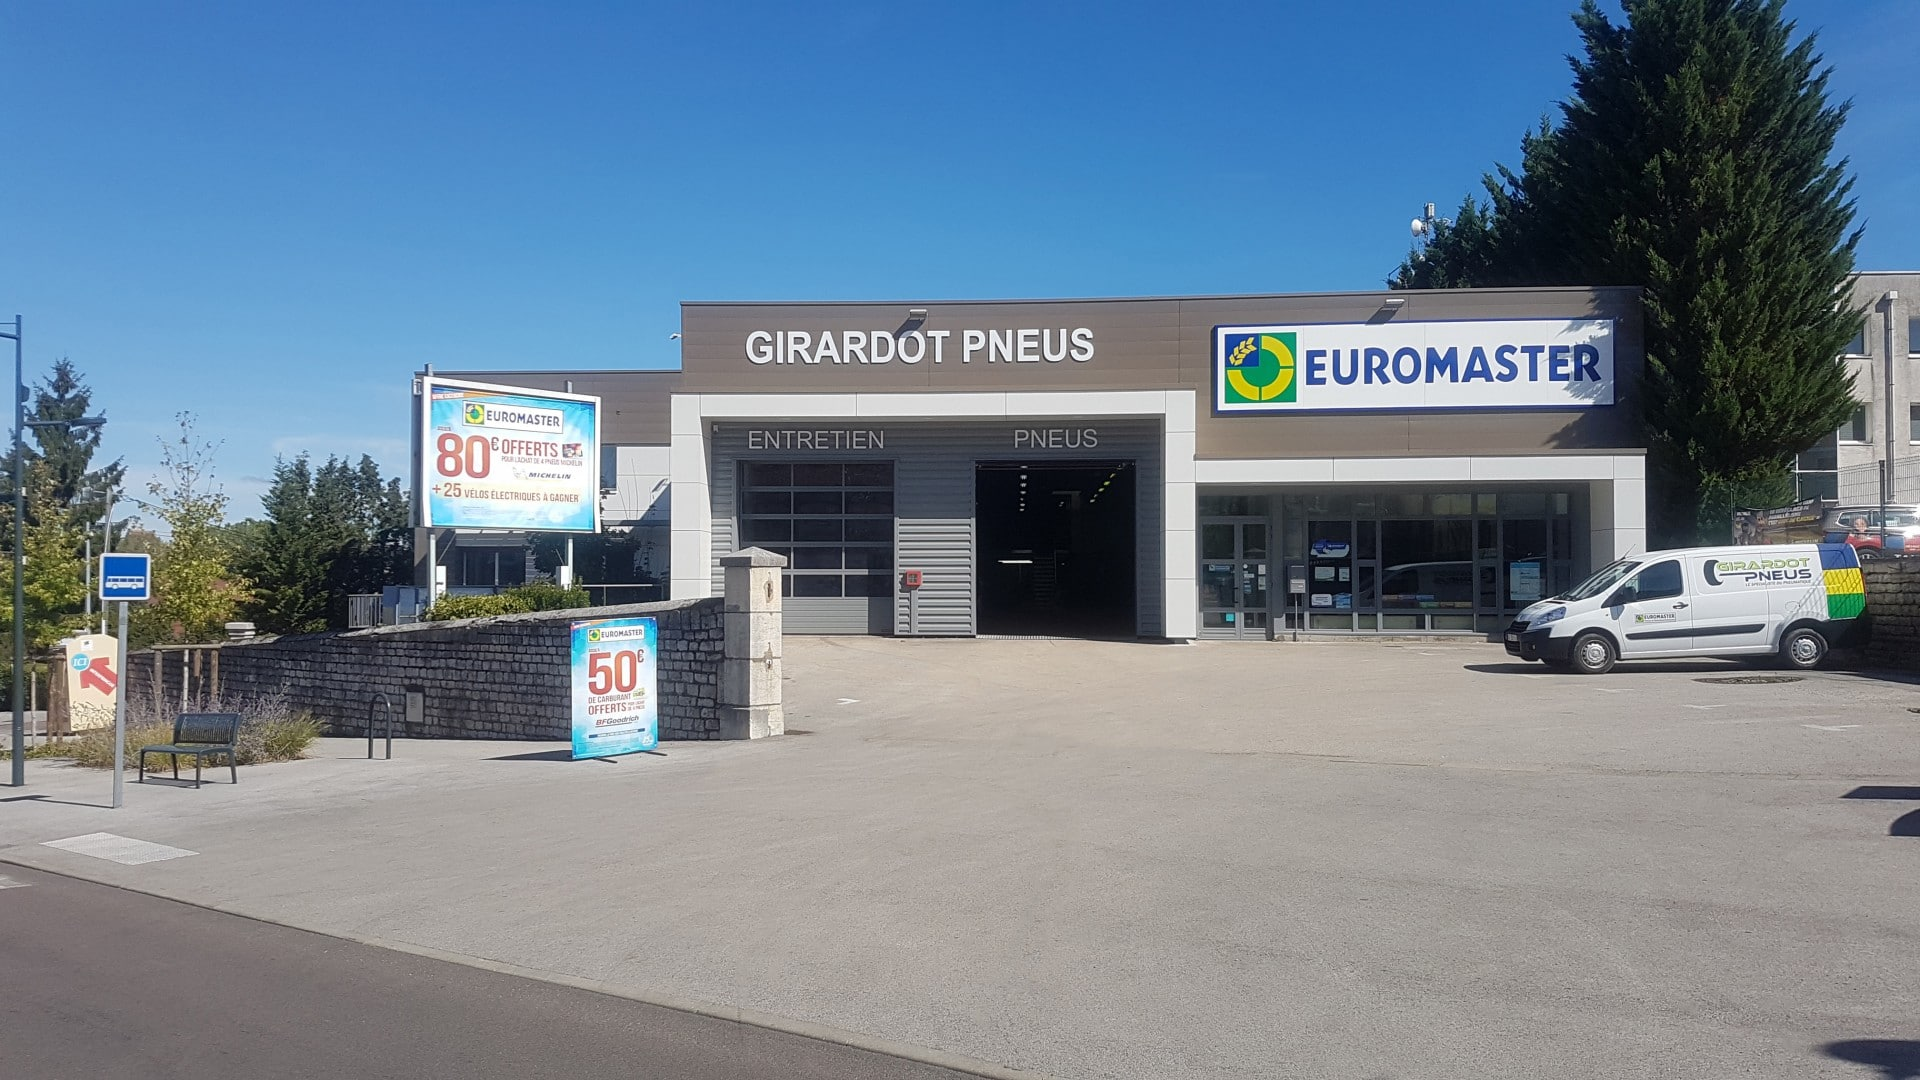 Pneus Girardot après rénovation